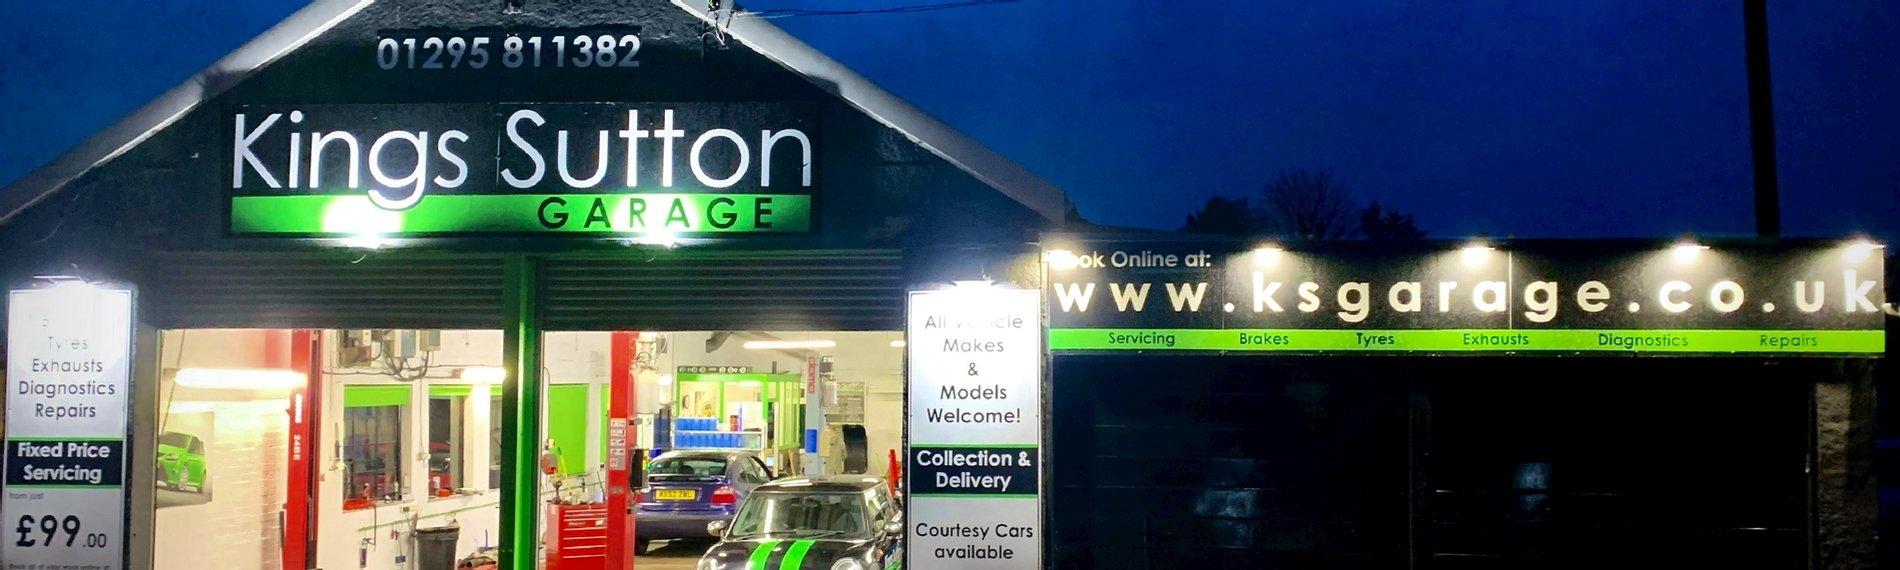 Contact Kings Sutton Garage